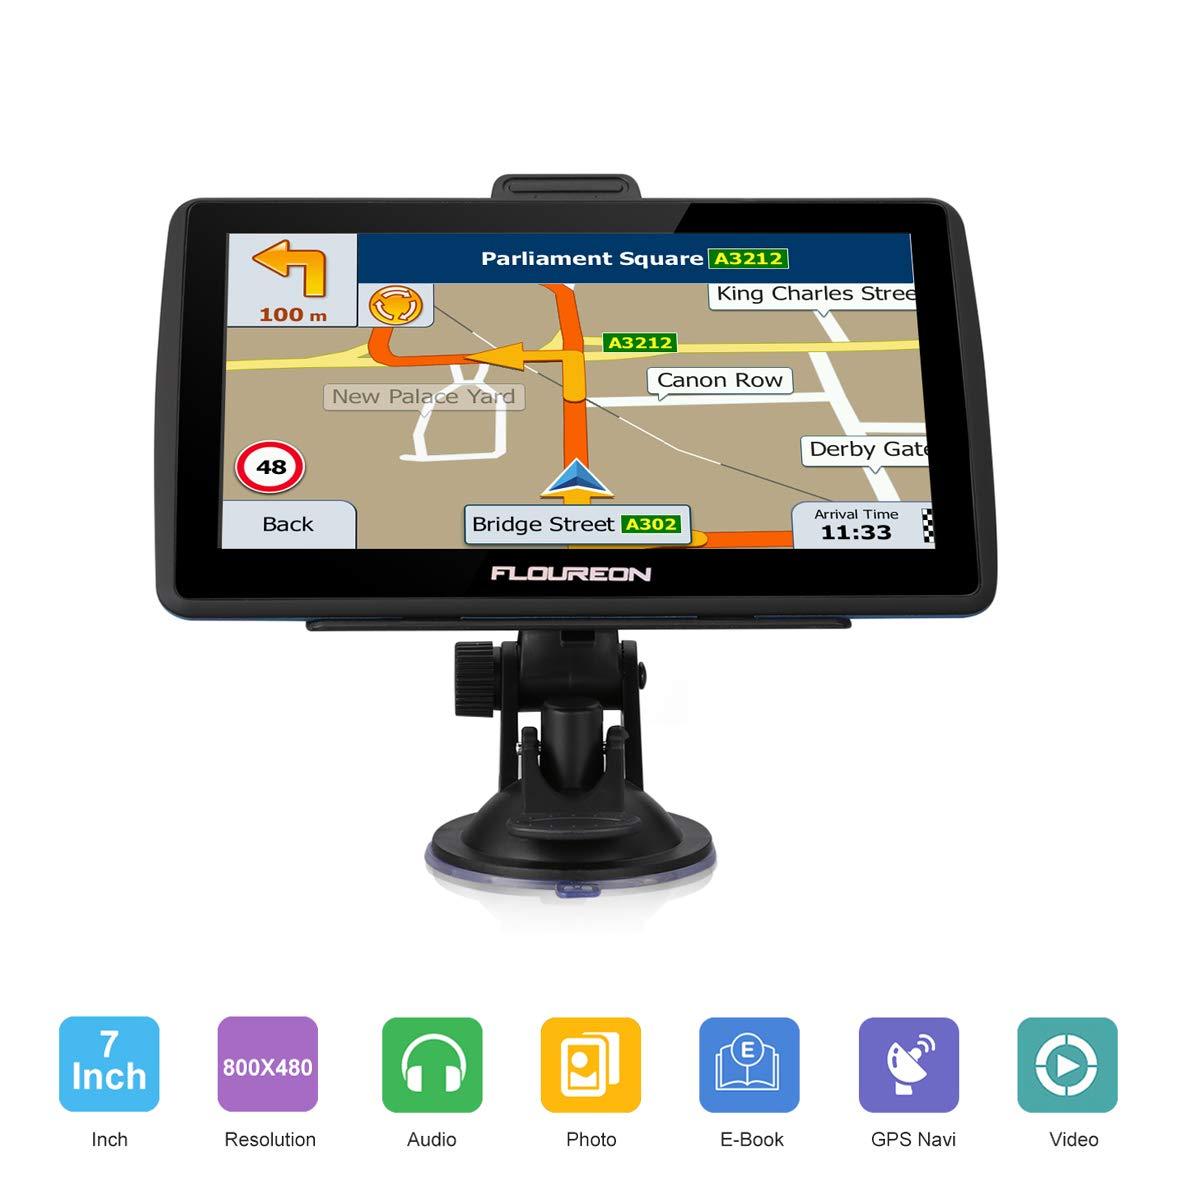 FLOUREON 7 Inch GPS Navigation SAT NAV Car Navigator Capacitive LCD Touch  Screen Lifetime Free European Map Updates Built-In 8GB 256MB Storage